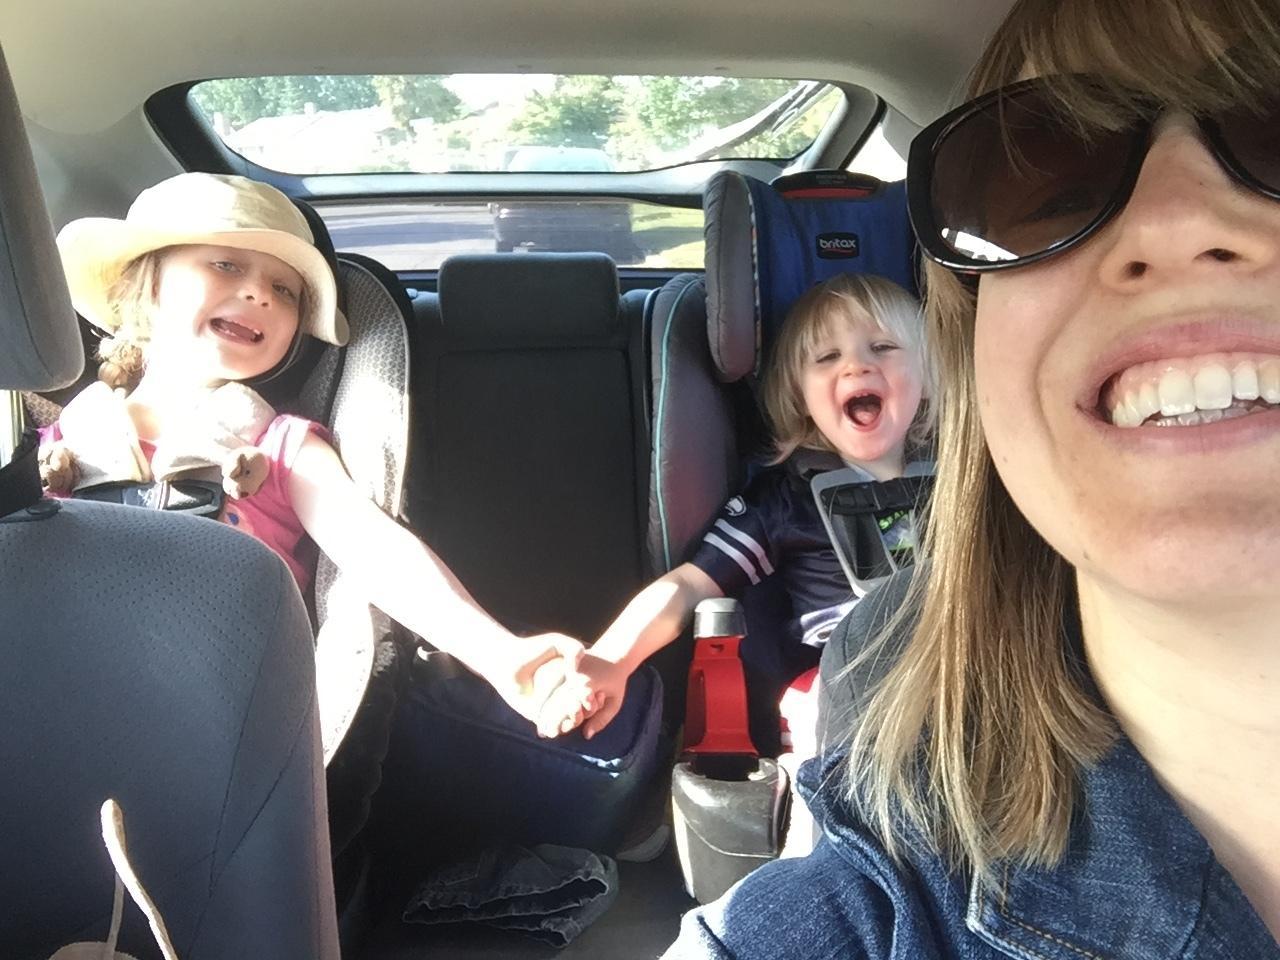 kg in car with kids.JPG